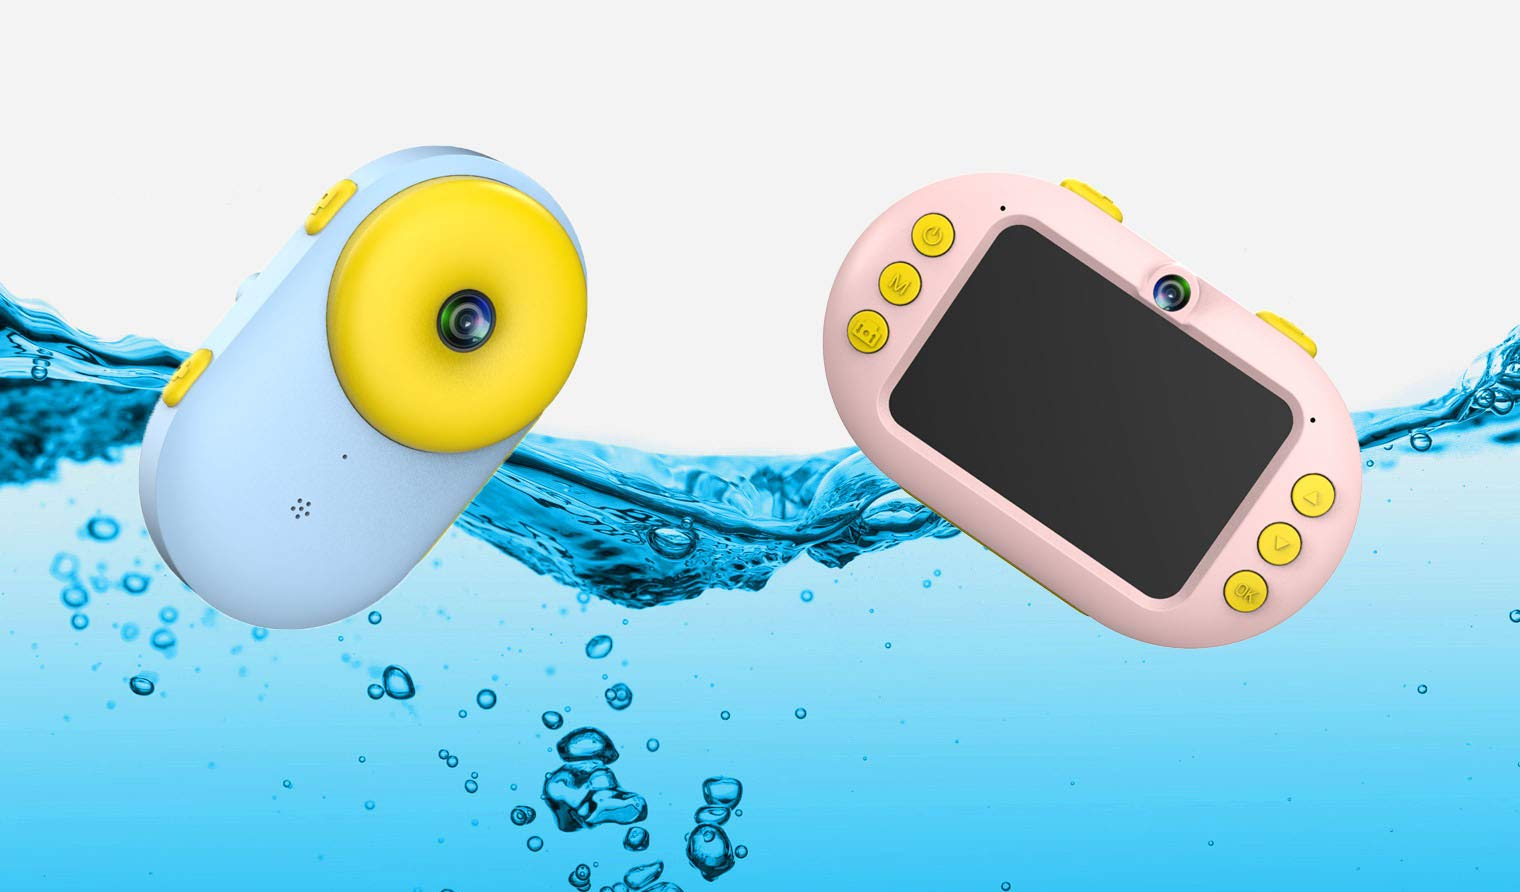 Waterproof Kids Camera, Magic Eye K8 Pink or Blue, Front and Rear Selfie HD Camera, Video and Filters, Underwater (Pink)